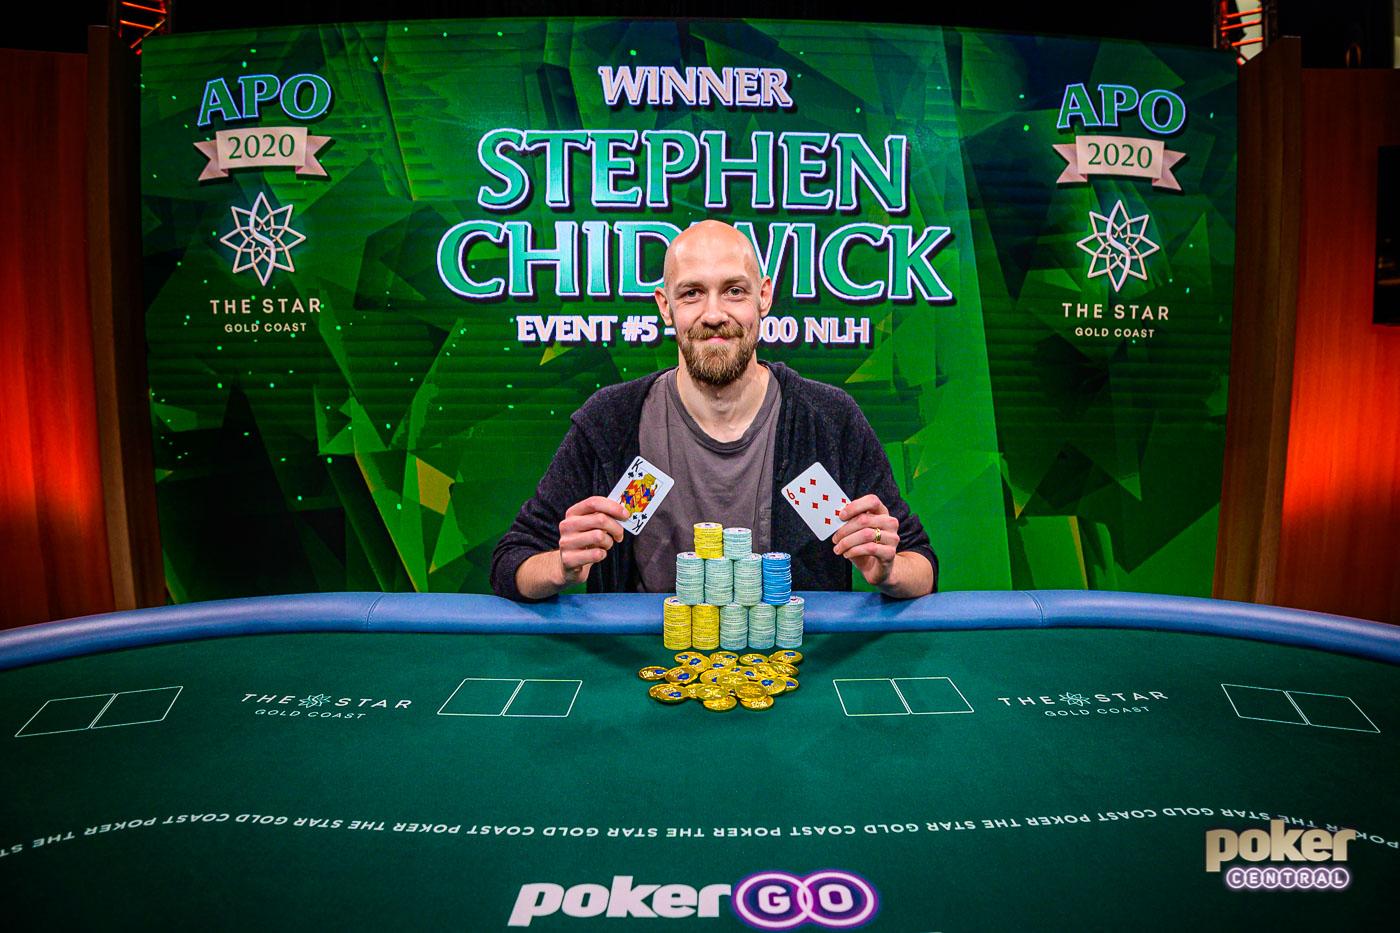 Stephen Chidwick wins the Australian Poker Open Champion!